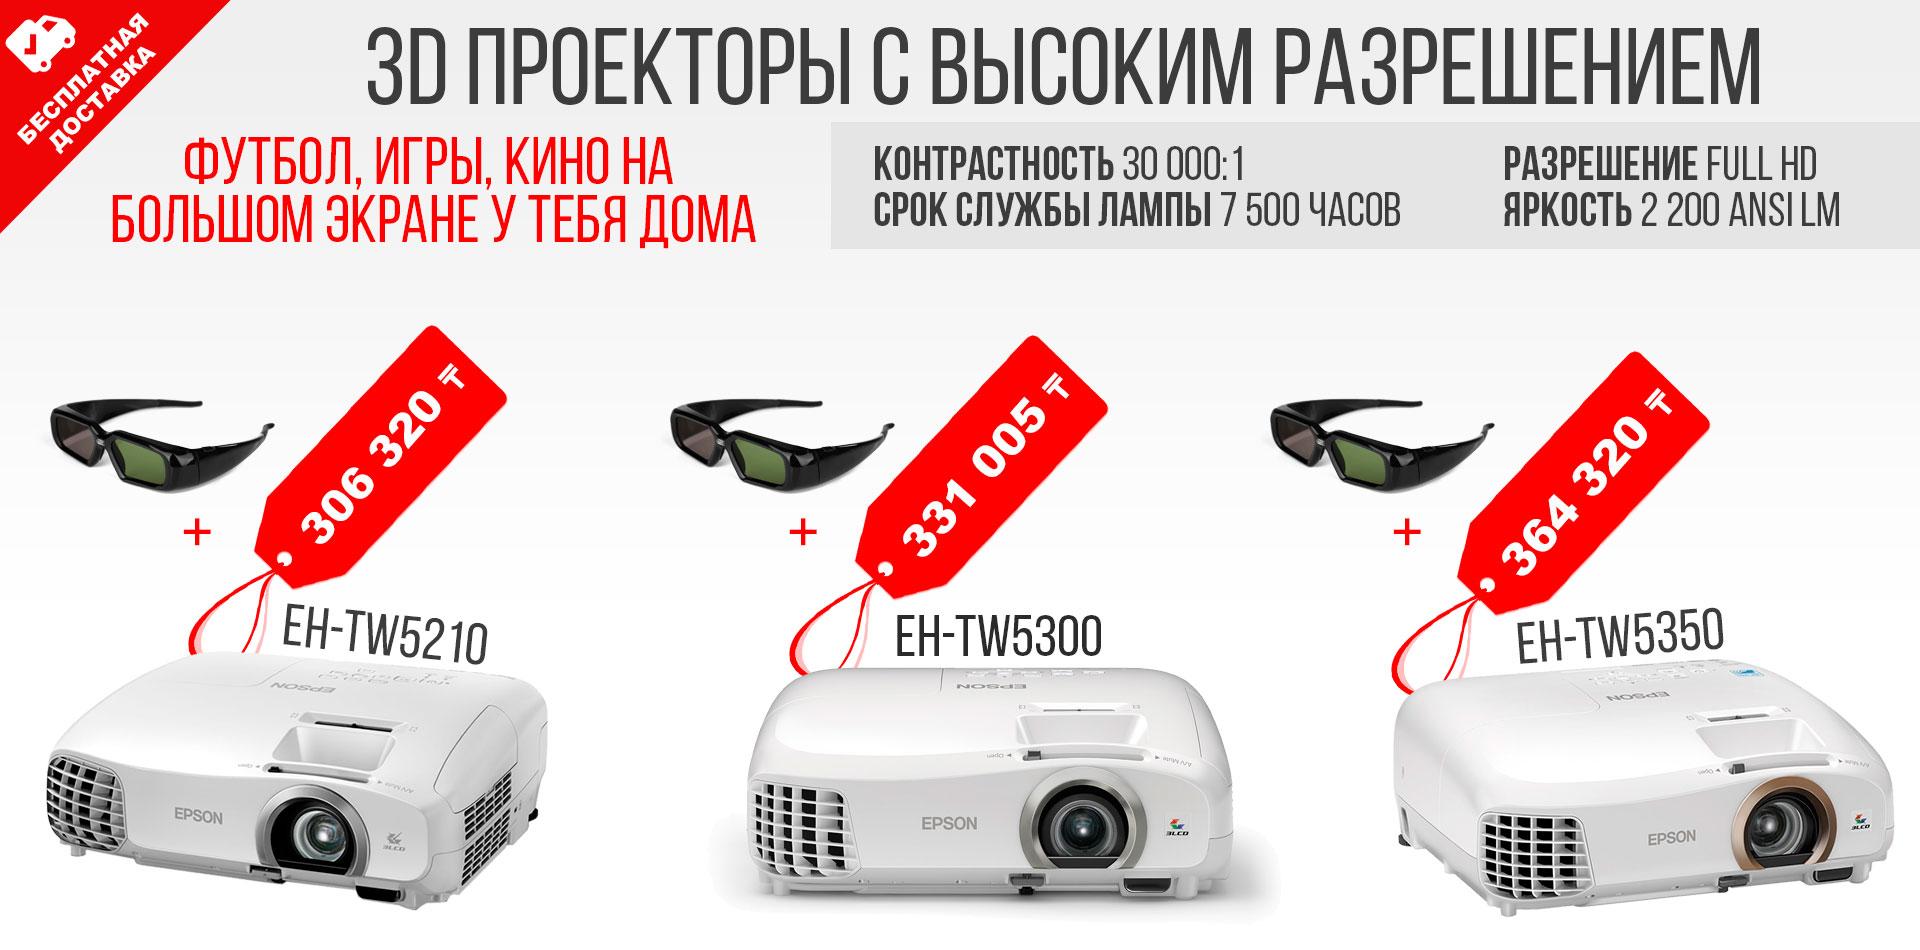 Epson EH-TW5210 В АСТАНЕ.